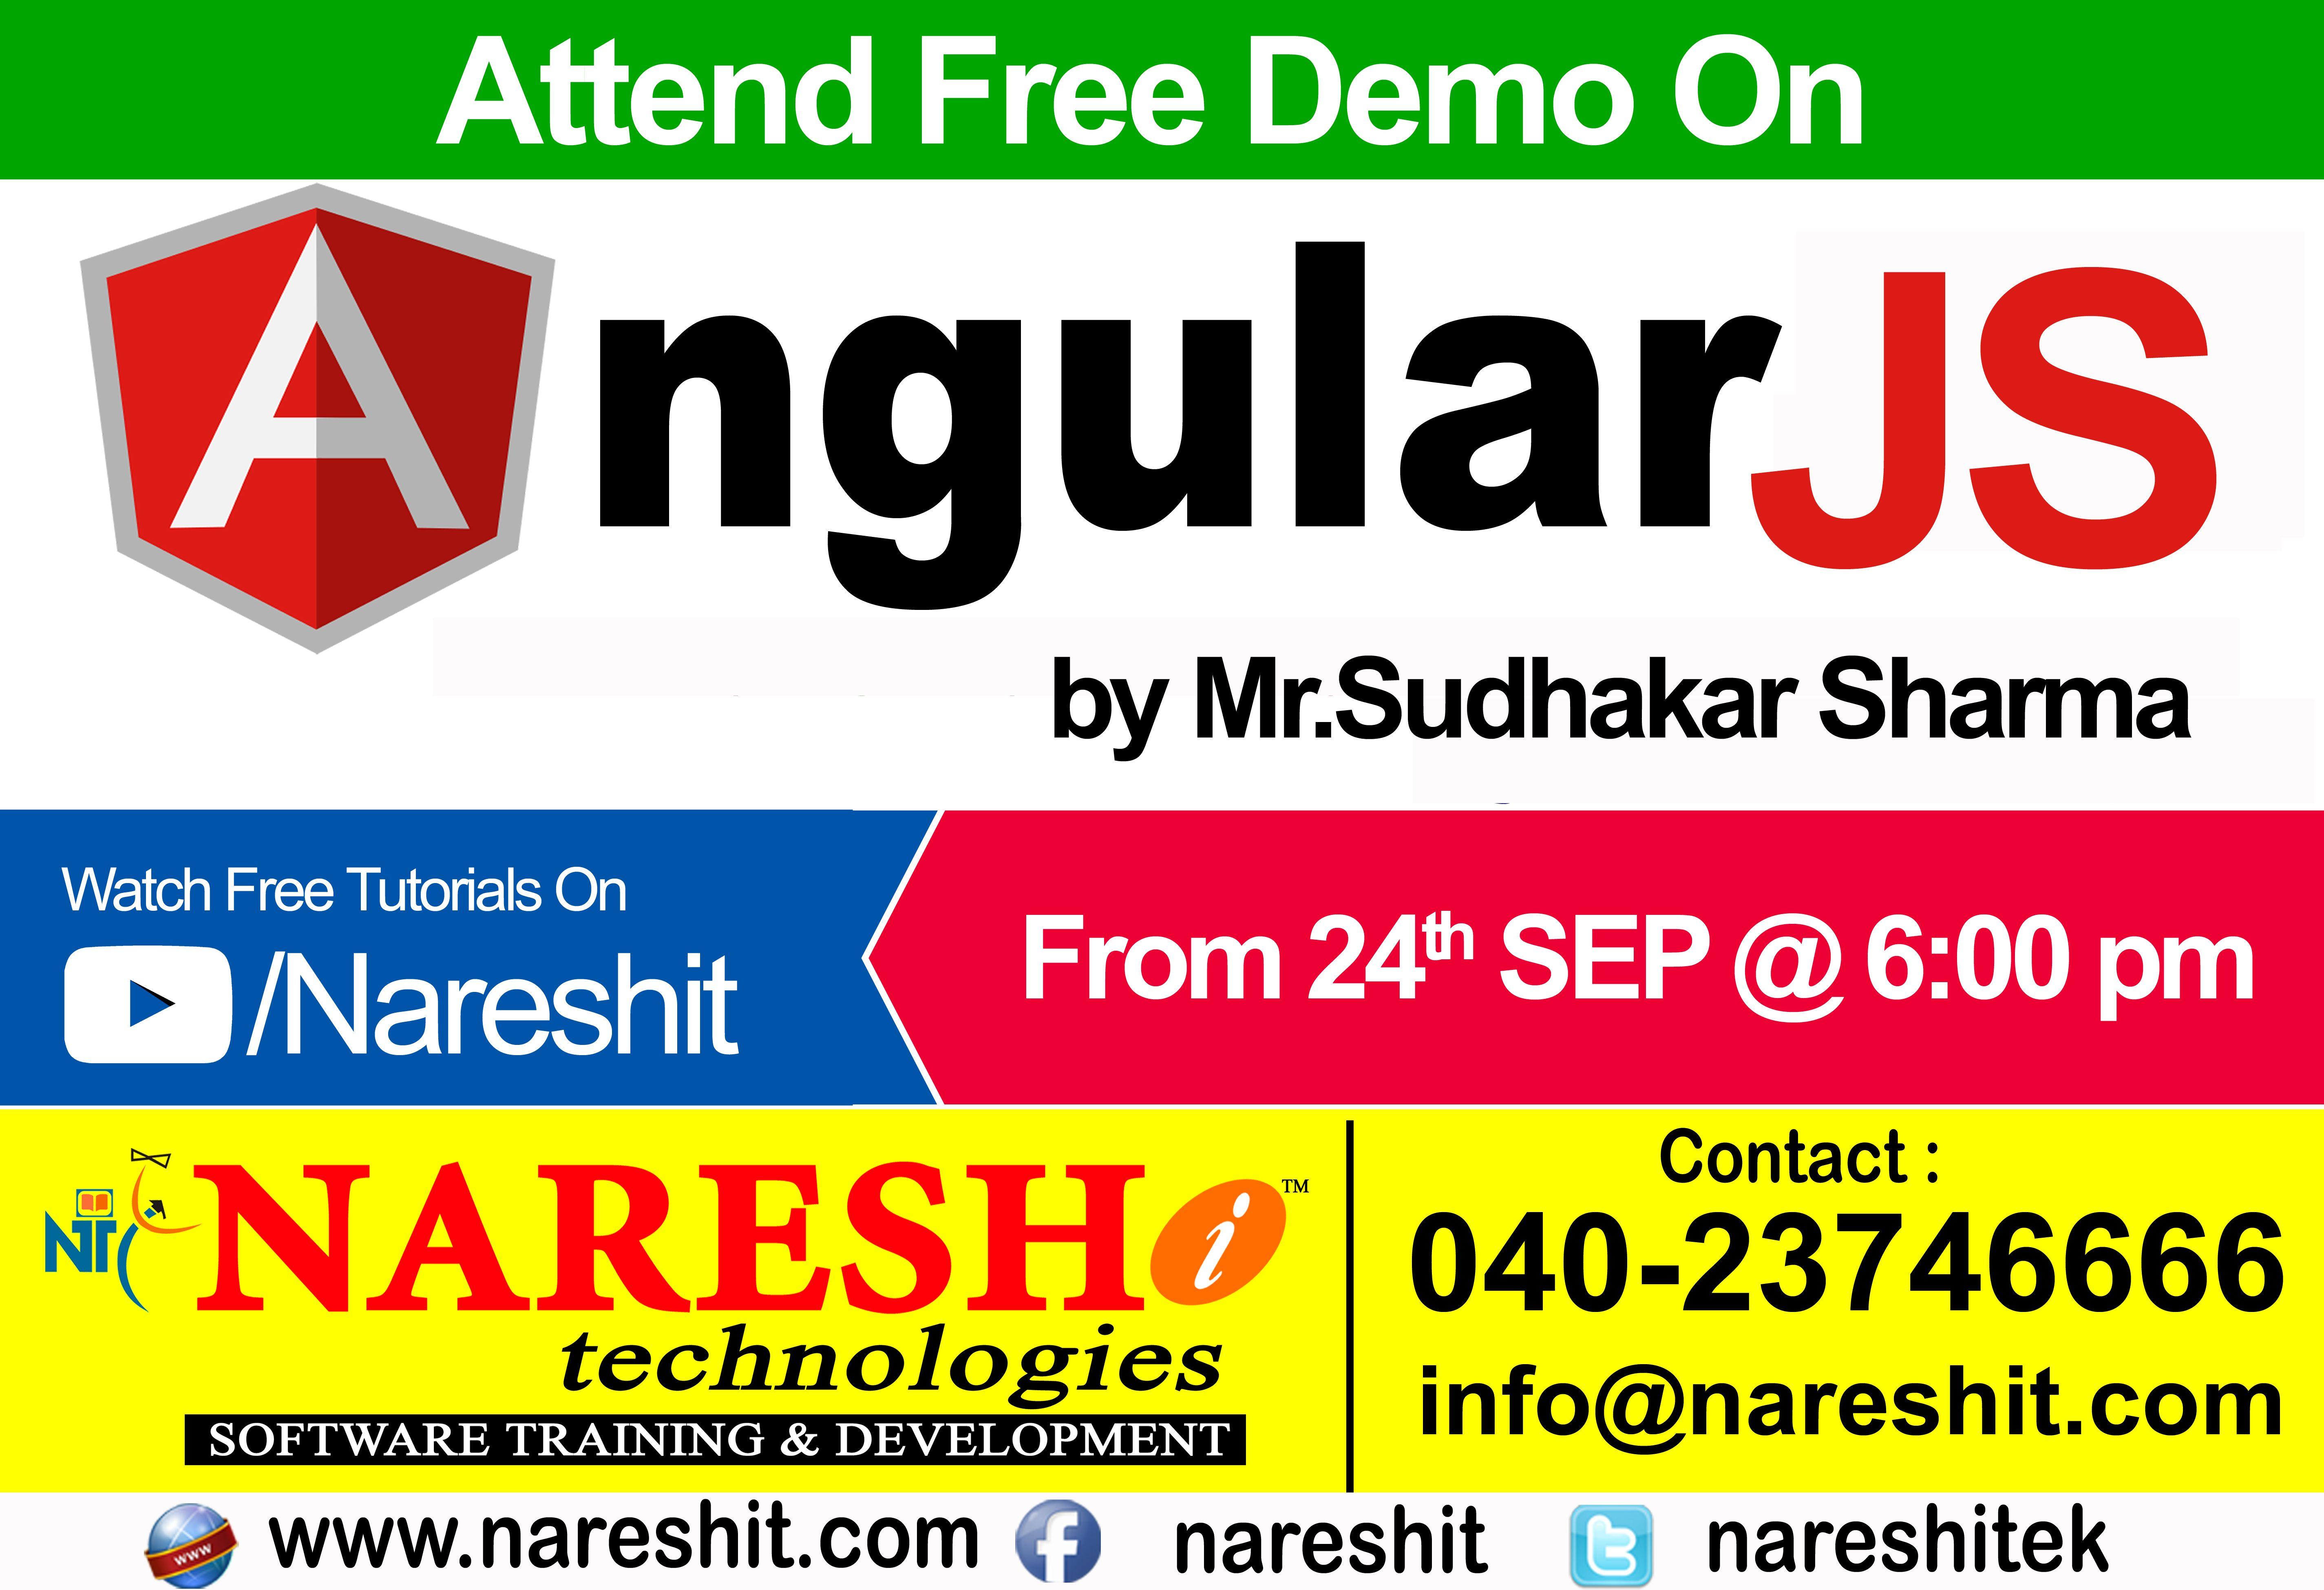 20 free angularjs tutorials & resources | learning, web.